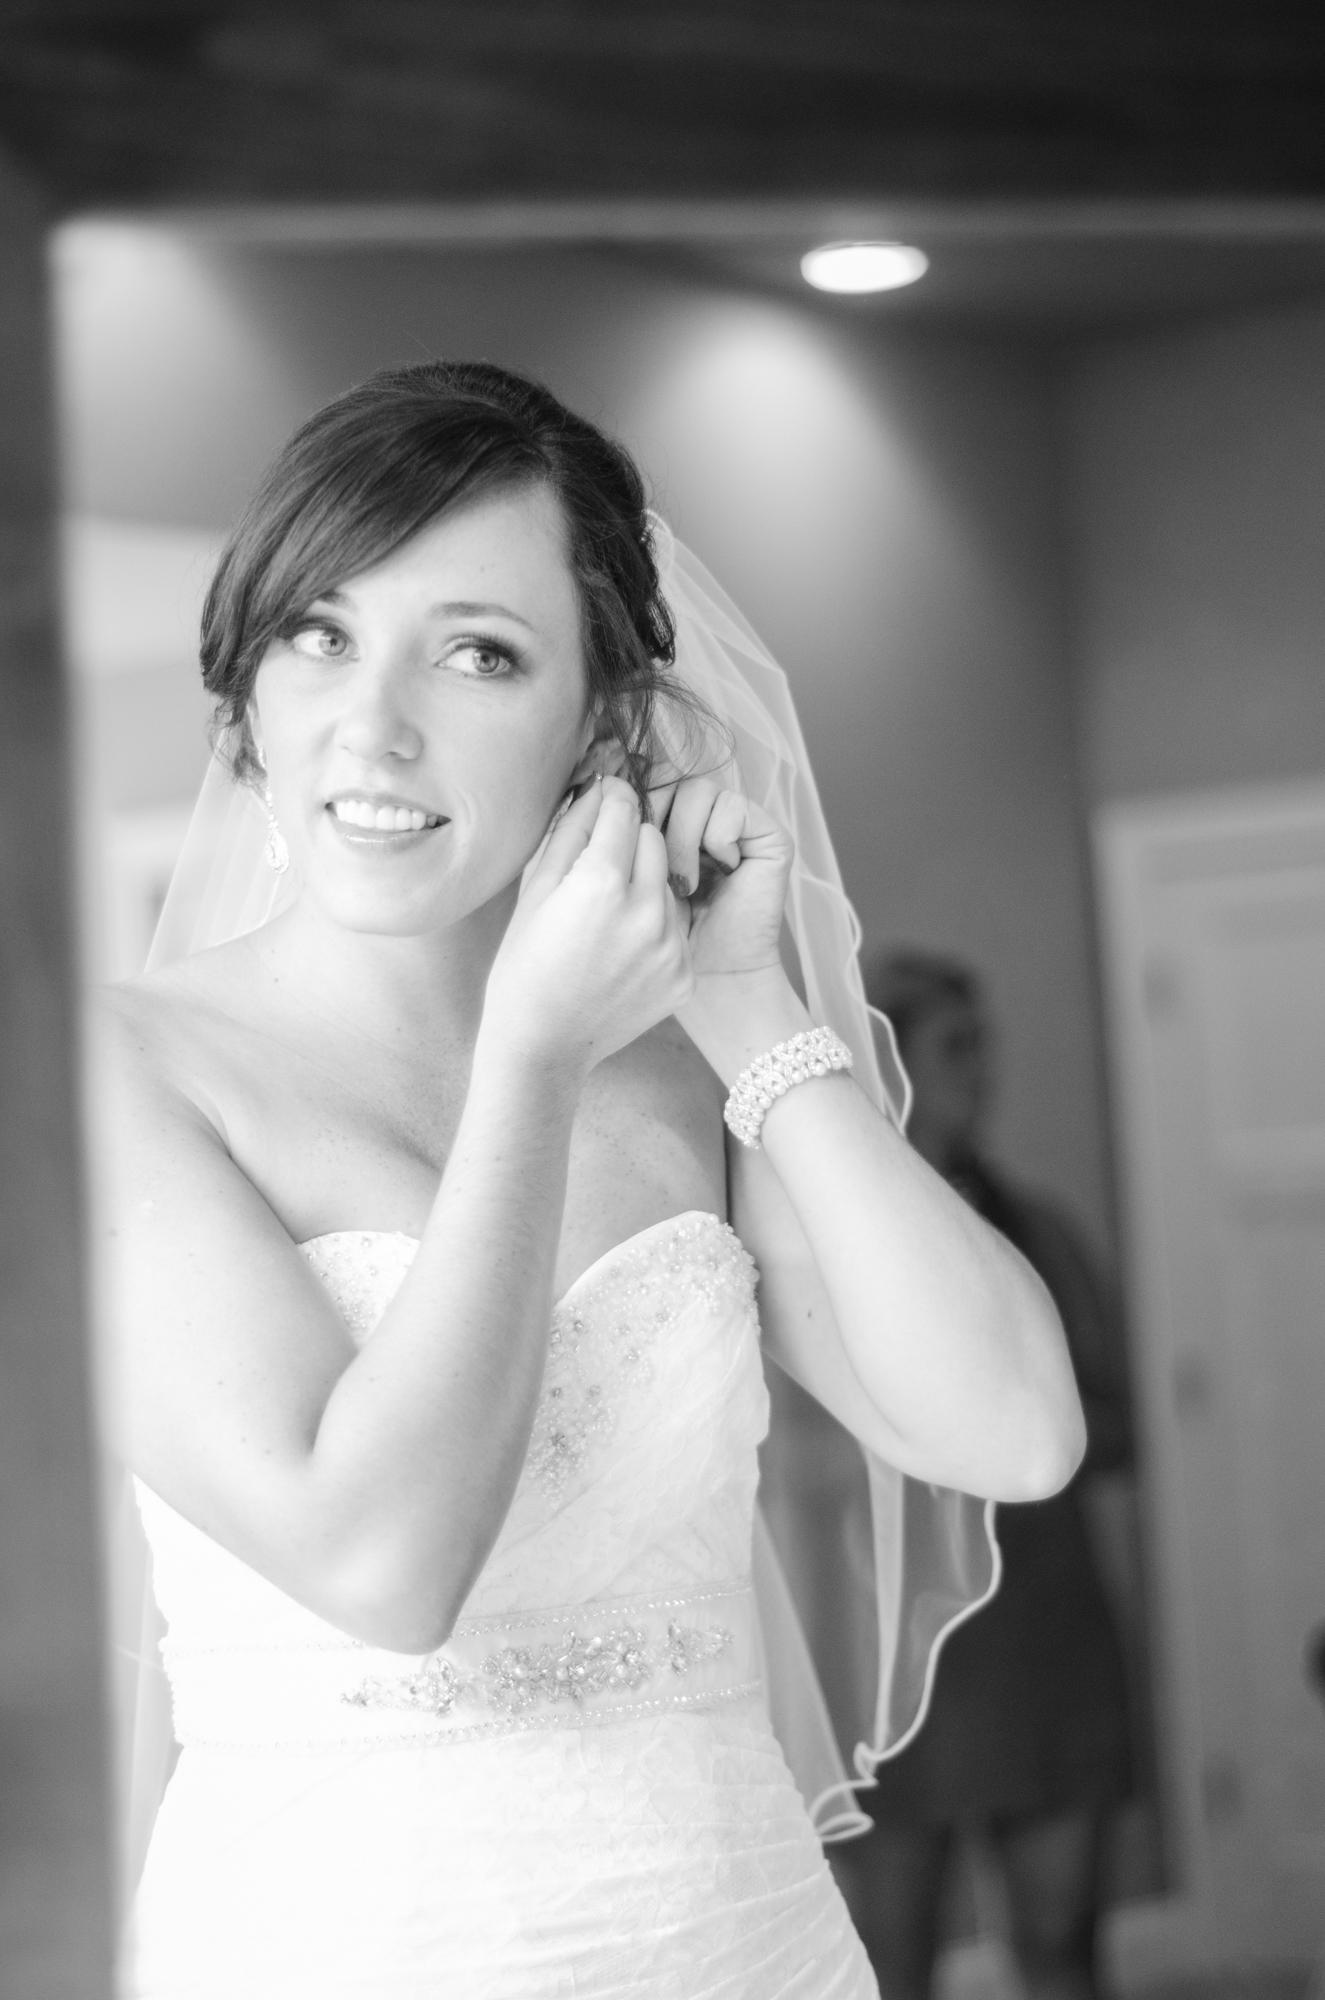 monica_chris_clarksville_wedding_photography-8811.jpg